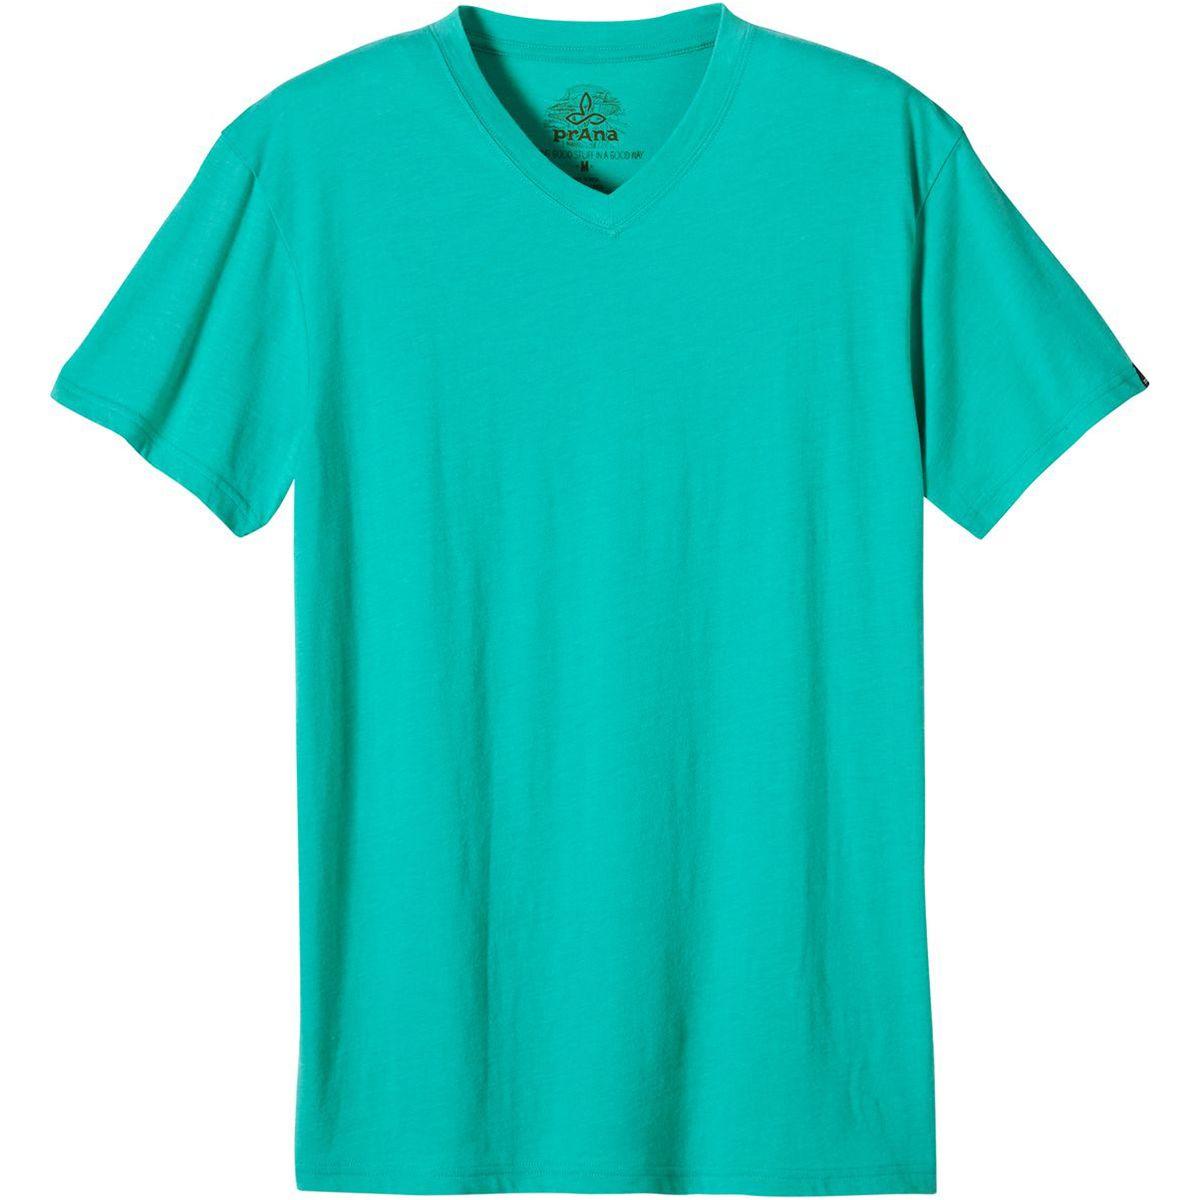 Prana V-Neck Slim Fit T-Shirt - Men